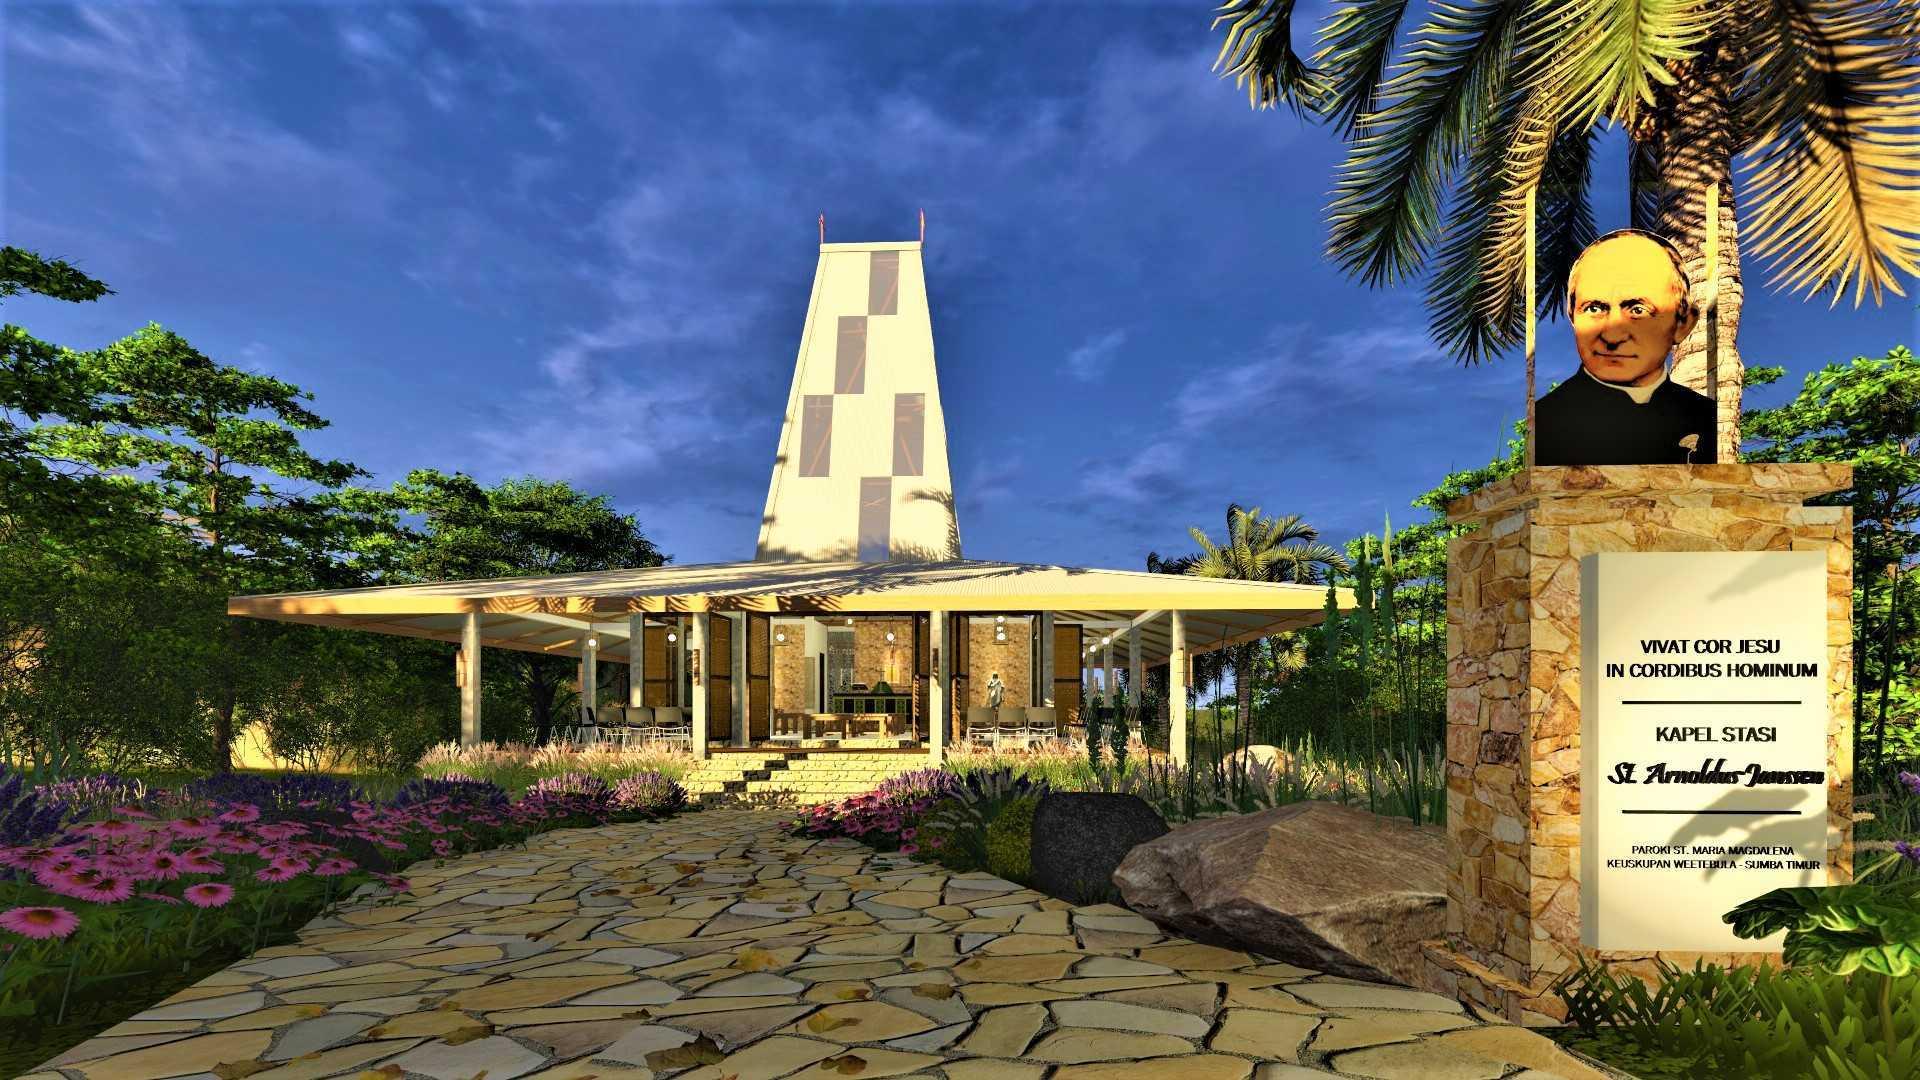 Jasa Arsitek Rahayu Architect di Sumba Timur